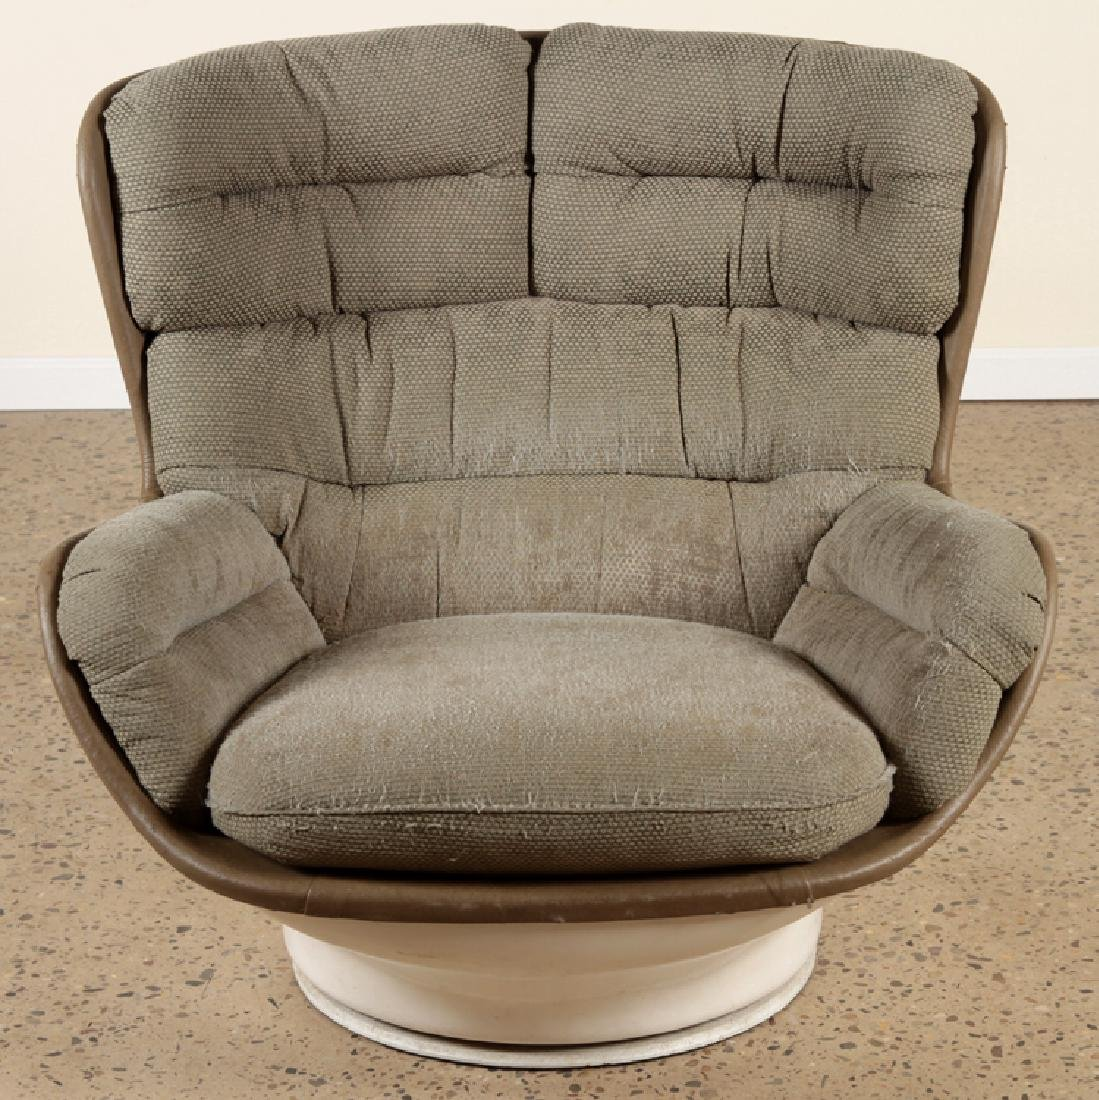 MID CENTURY MODERN EGG CHAIR UPHOLSTERED SEAT - 2